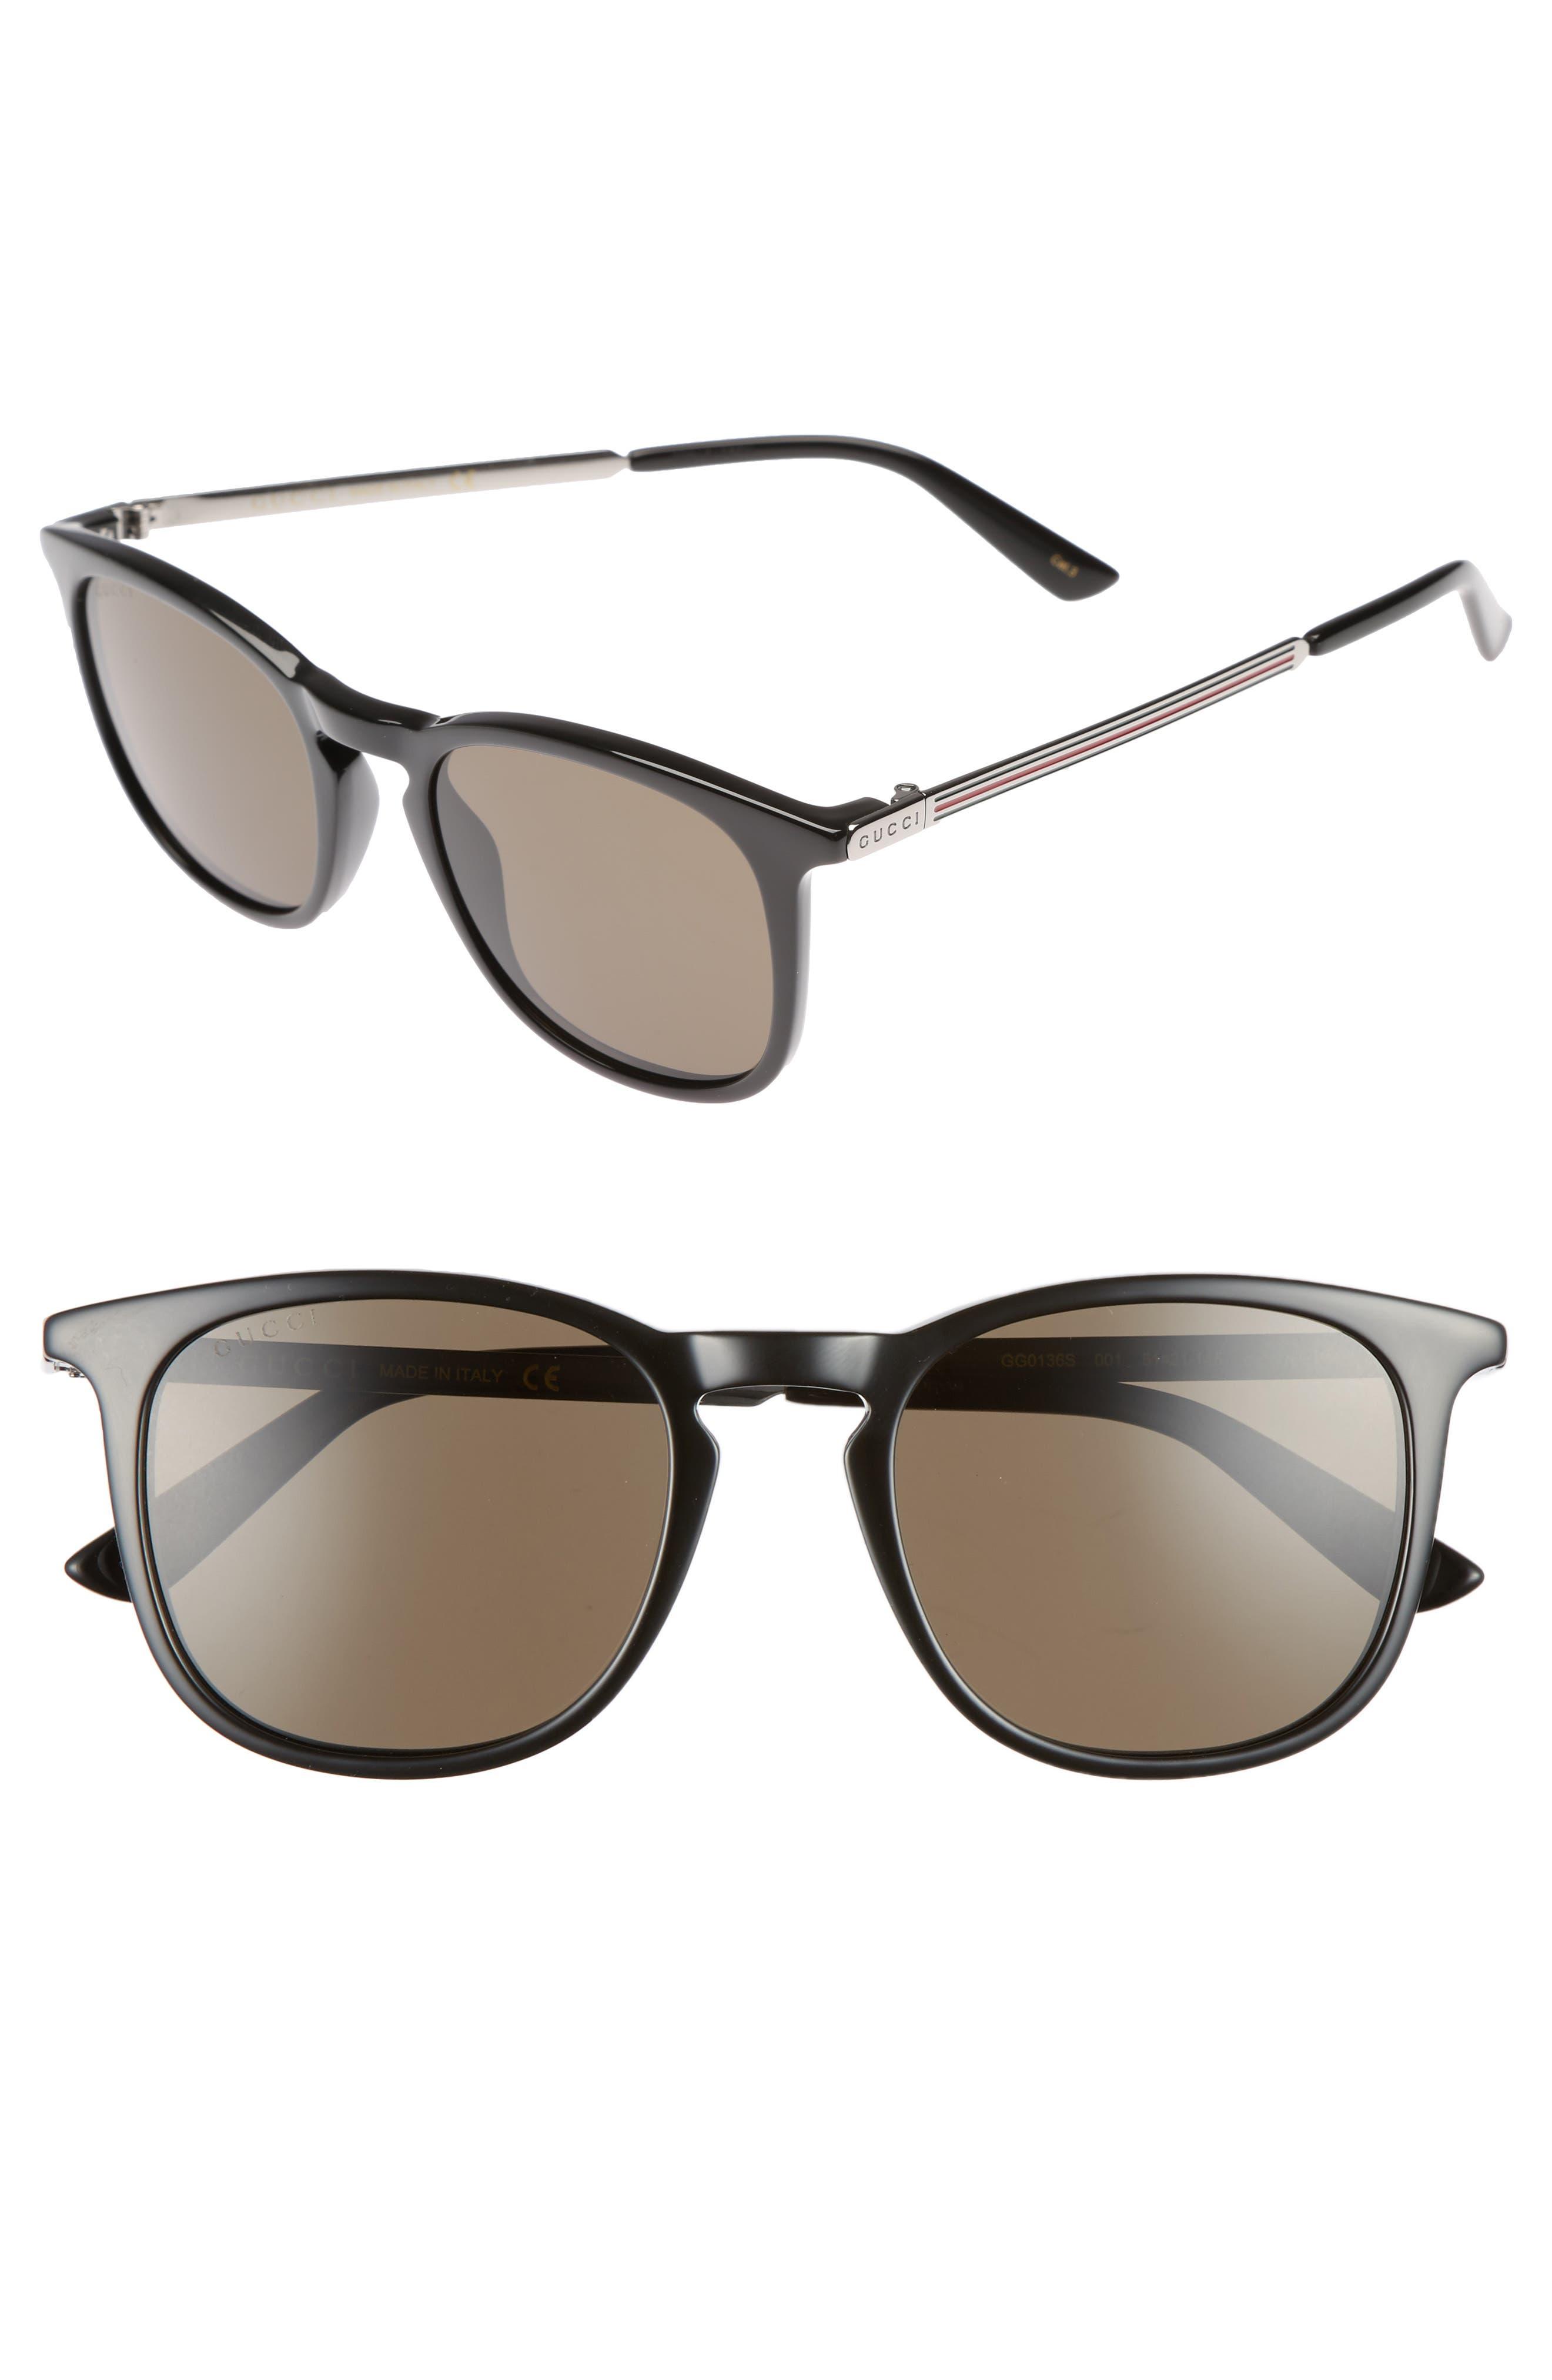 Optyl 51mm Sunglasses,                             Main thumbnail 1, color,                             001